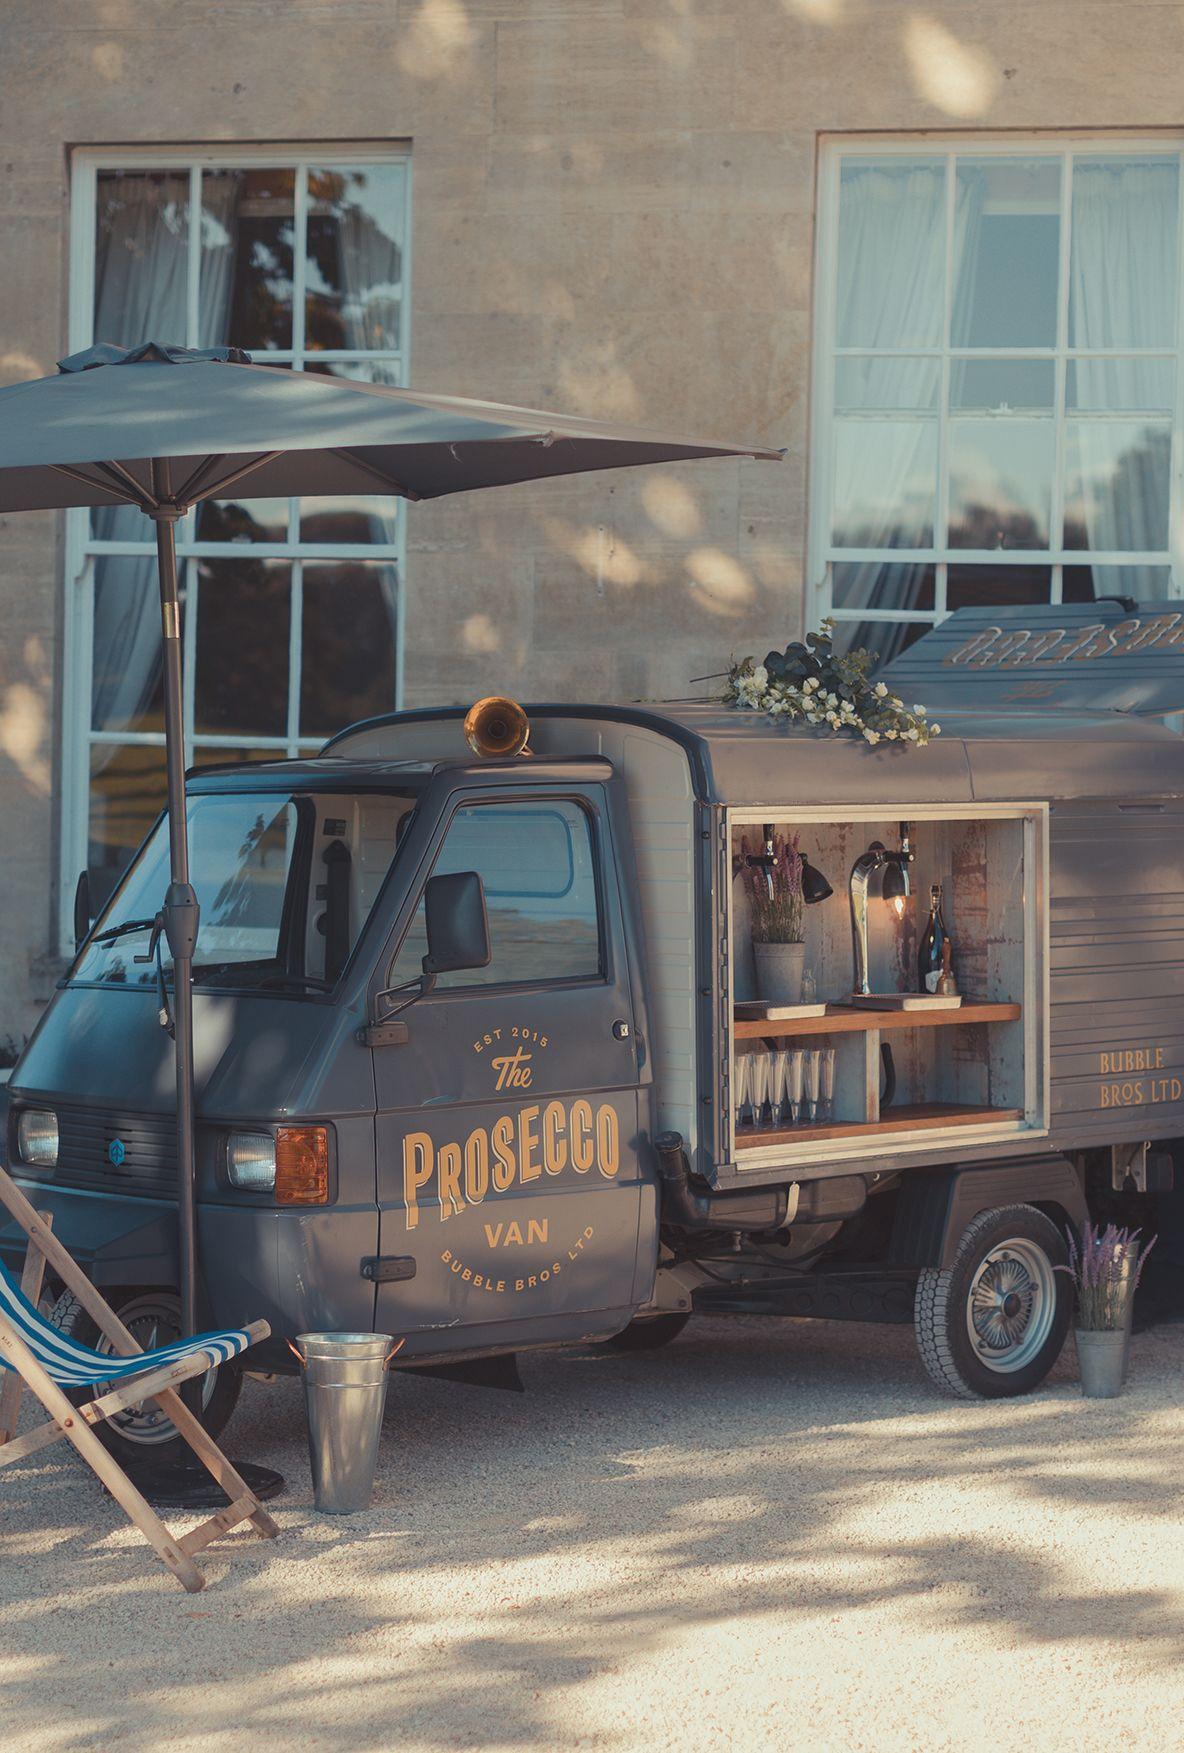 bubble bros prosecco vans and wedding bars rmw van profile